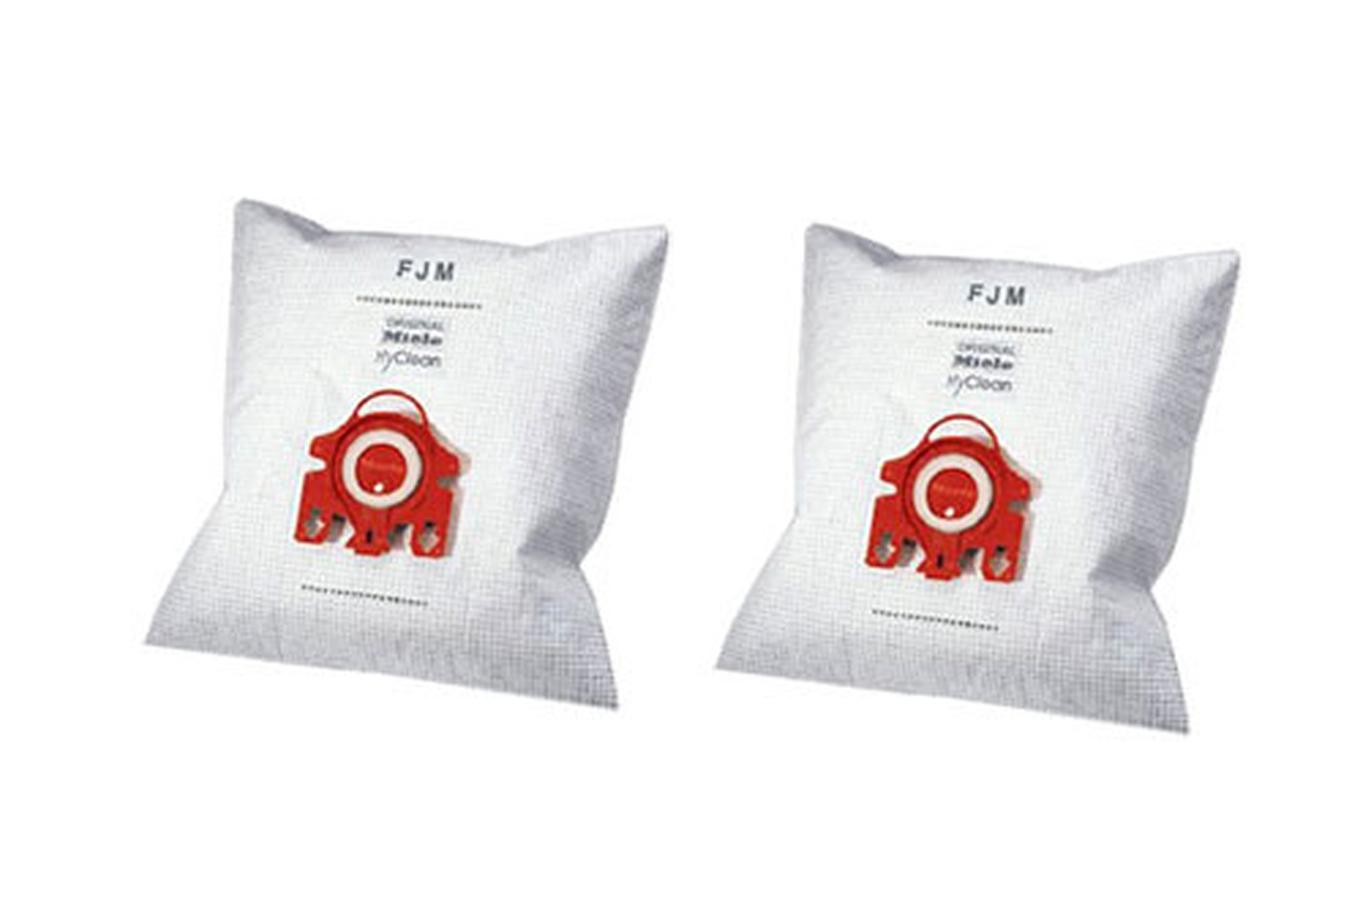 sac aspirateur miele pack 8 sacs fjm hyclean 3276503 darty. Black Bedroom Furniture Sets. Home Design Ideas